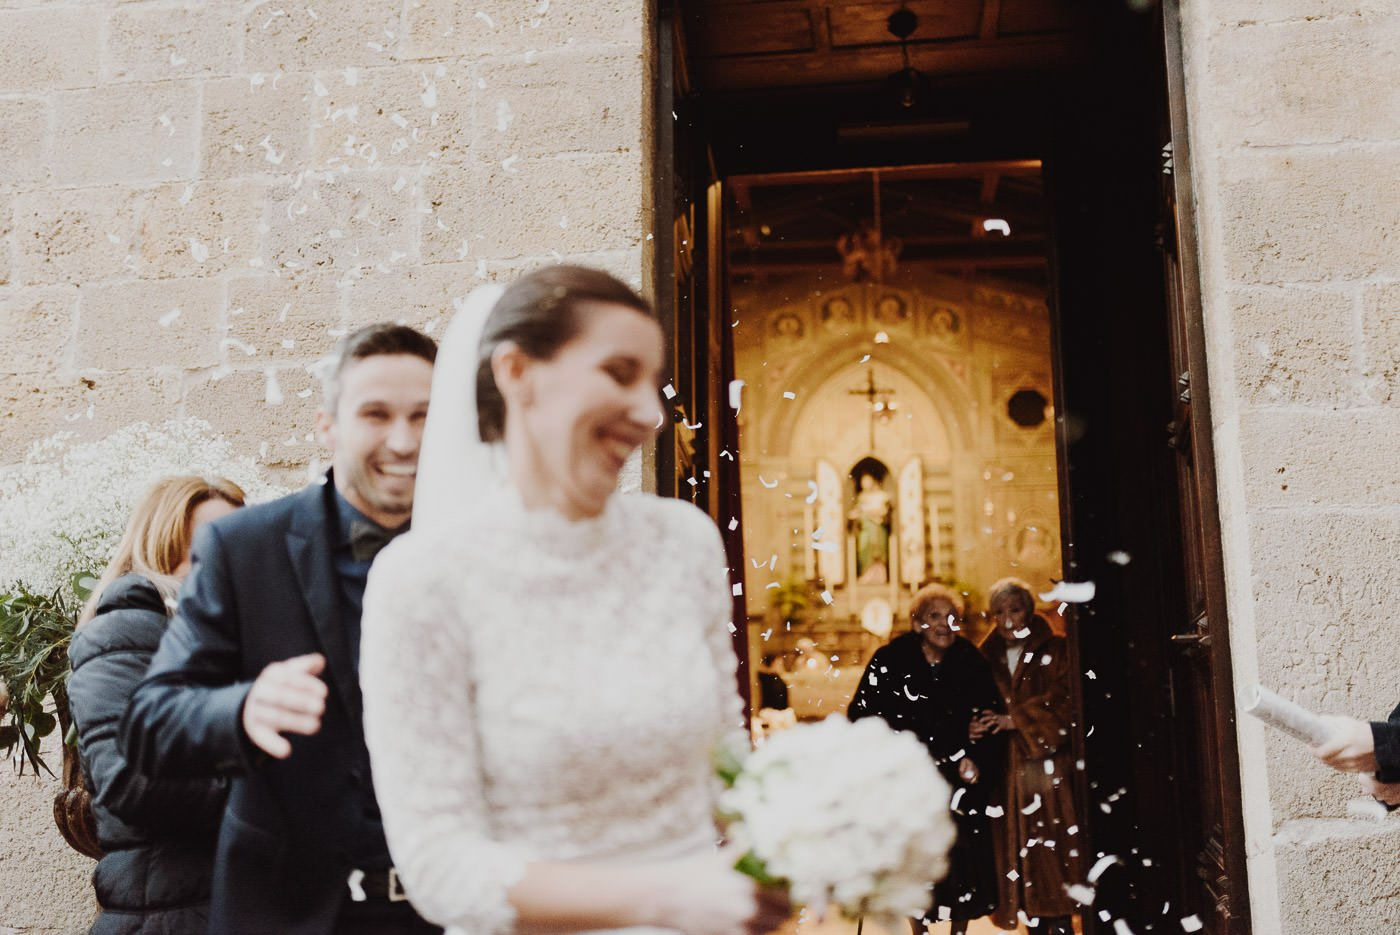 Matrimonio Giulia & Alessandro 28_12 – Alessio Nobili Photographer-28